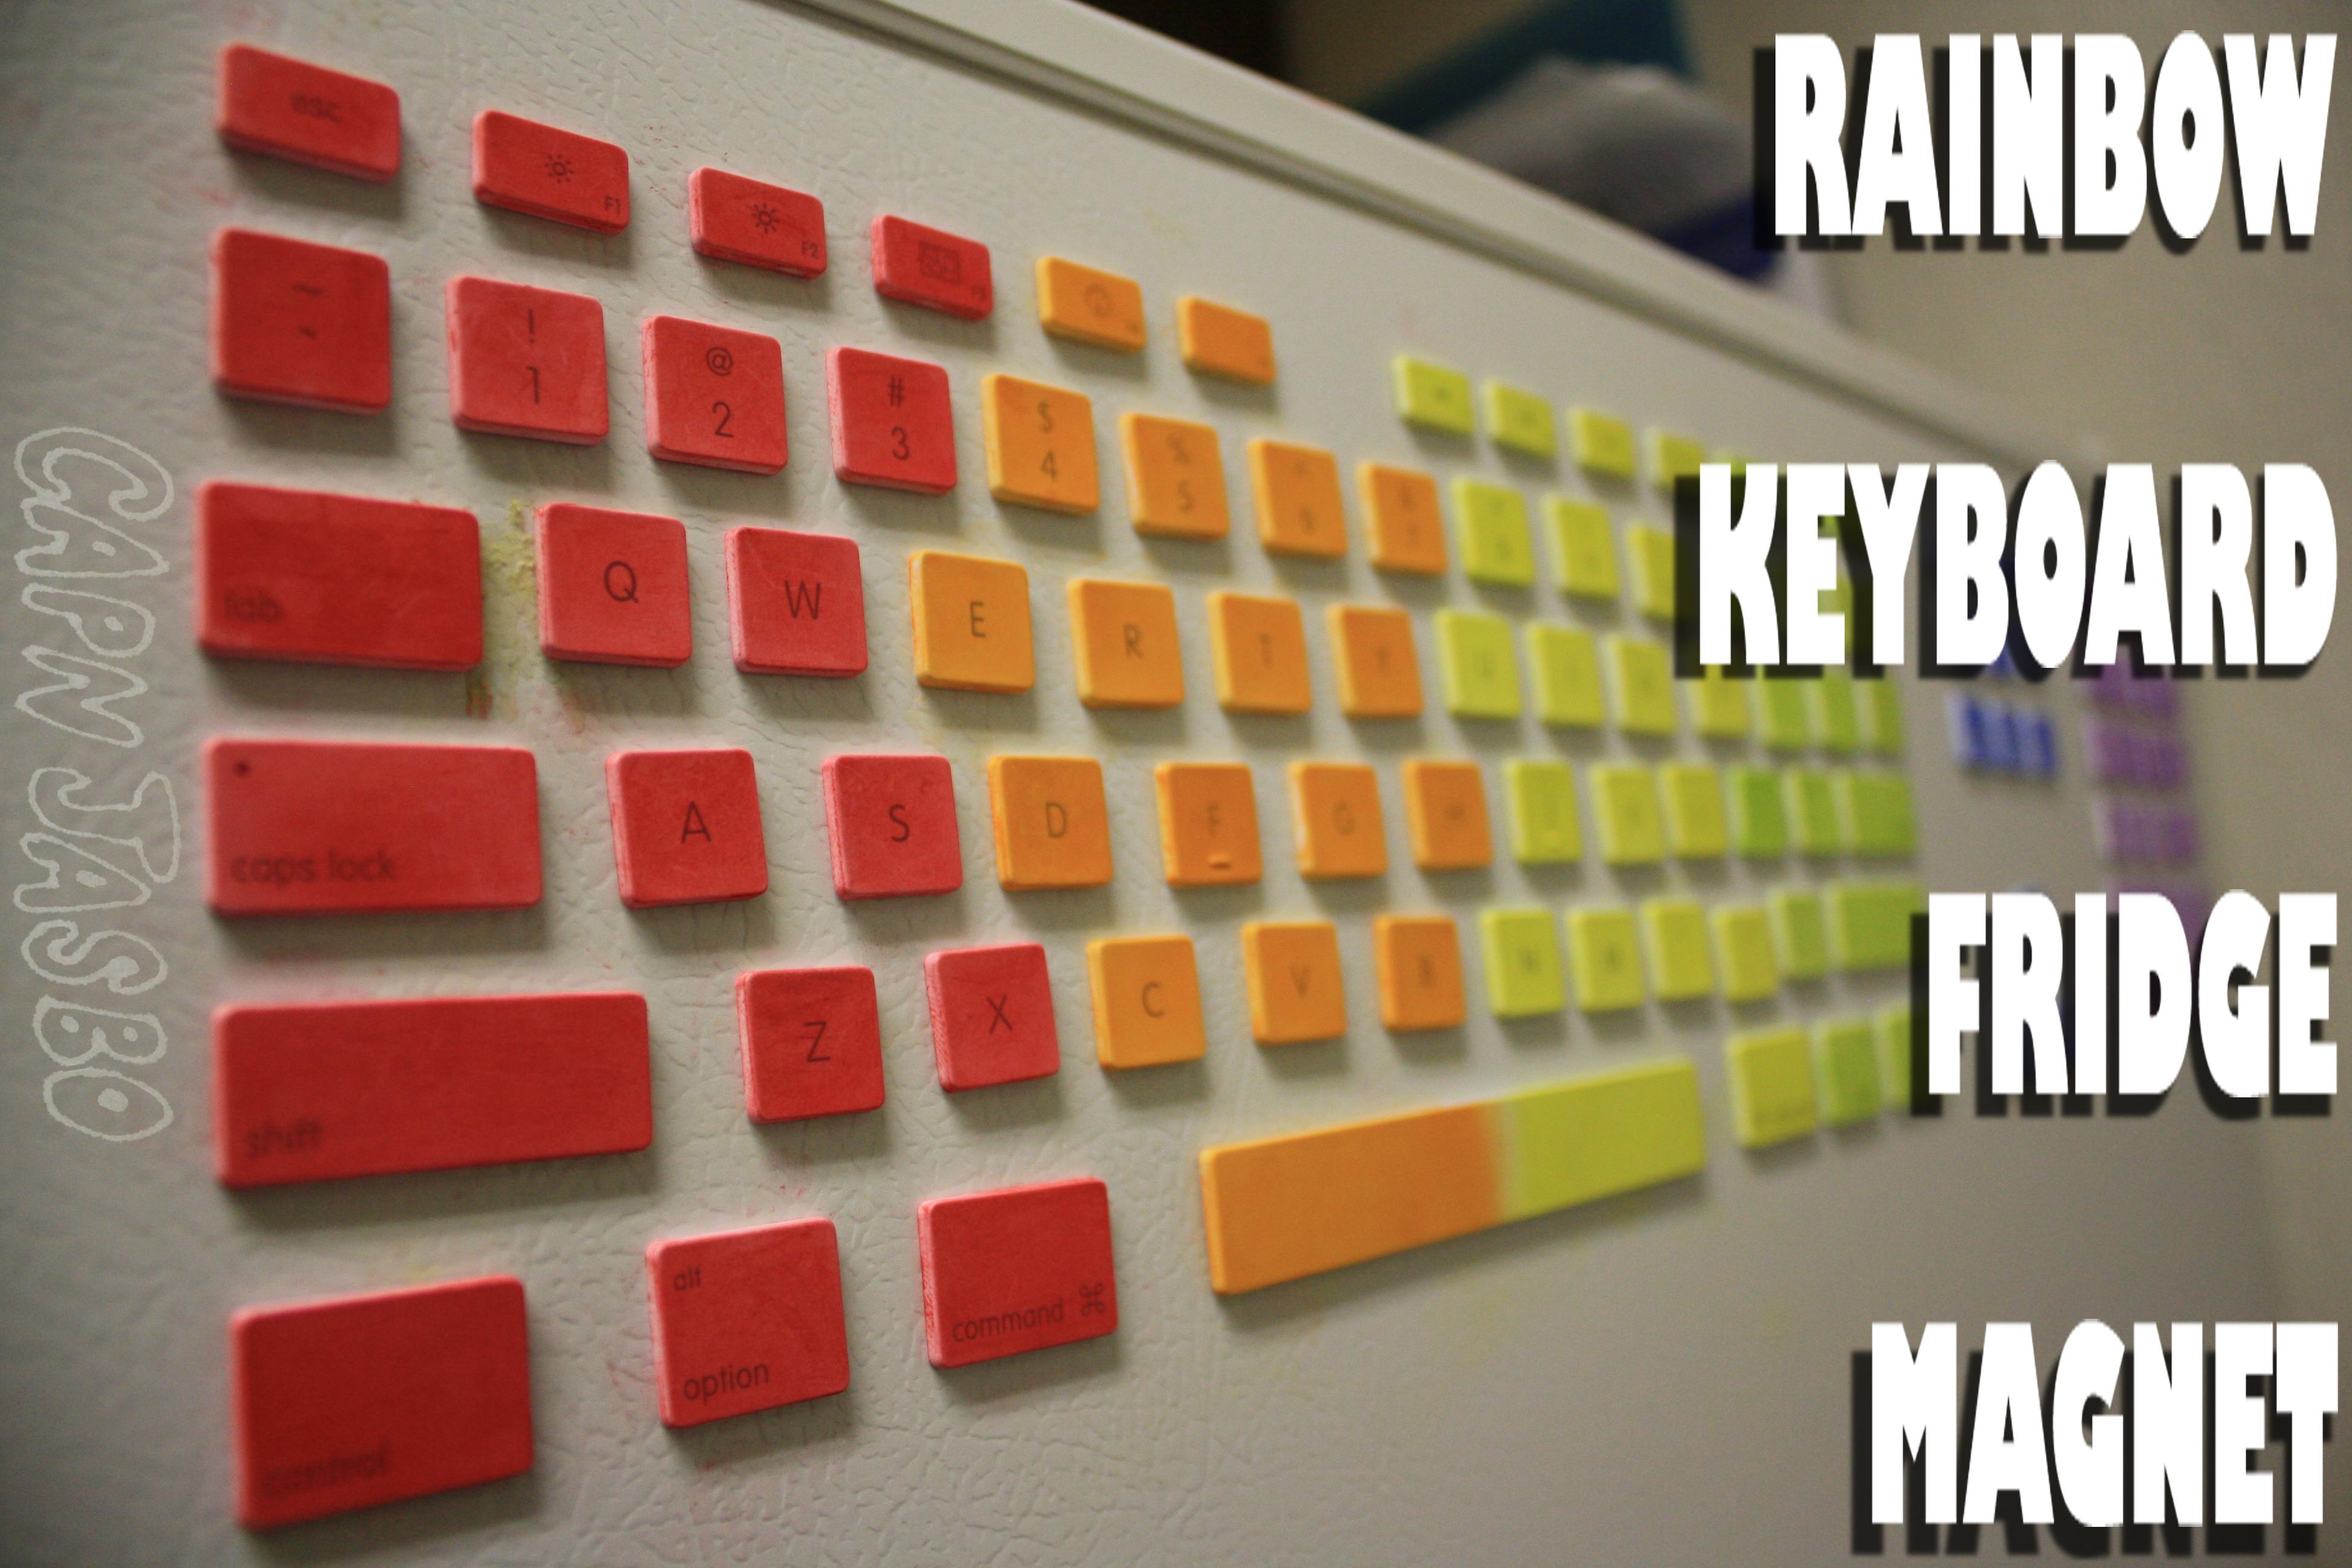 Picture of RAINBOW KEYBOARD FRIDGE MAGNET